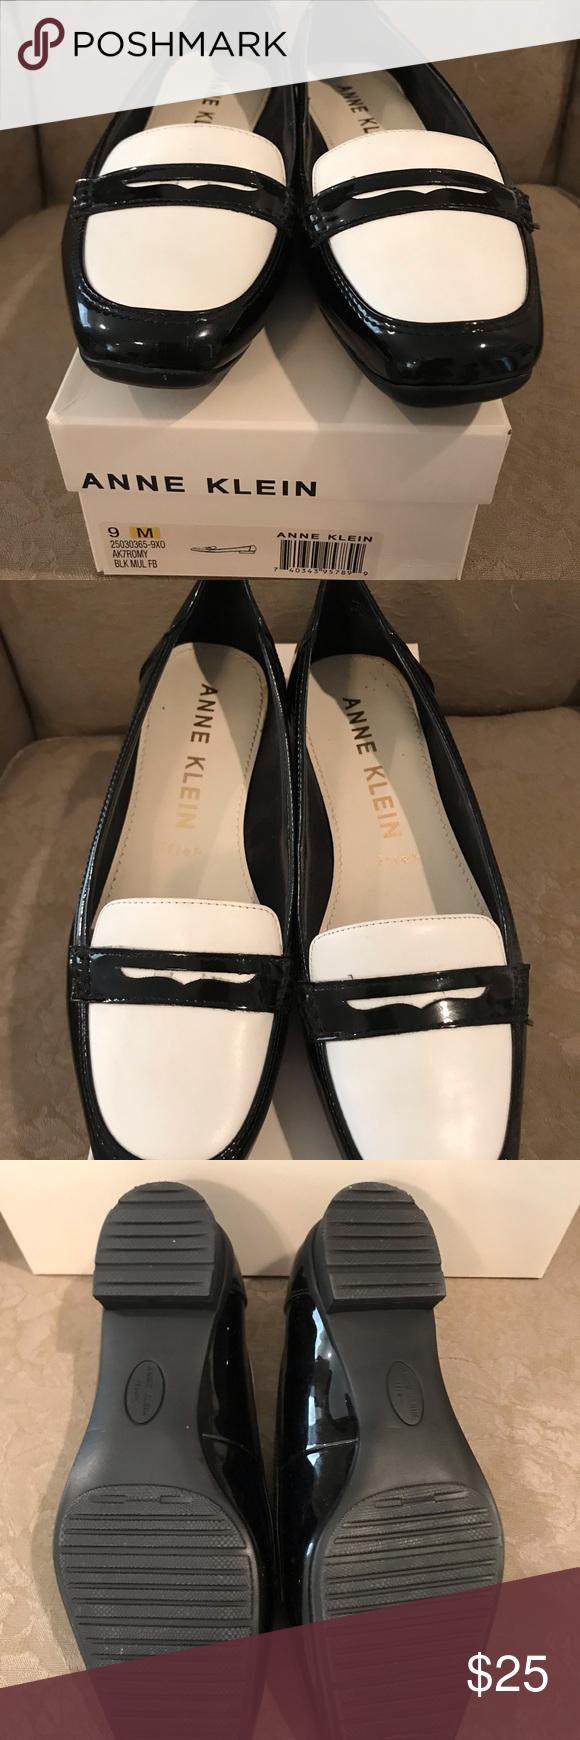 Anne Klein Size 9 Black Patent Loafer